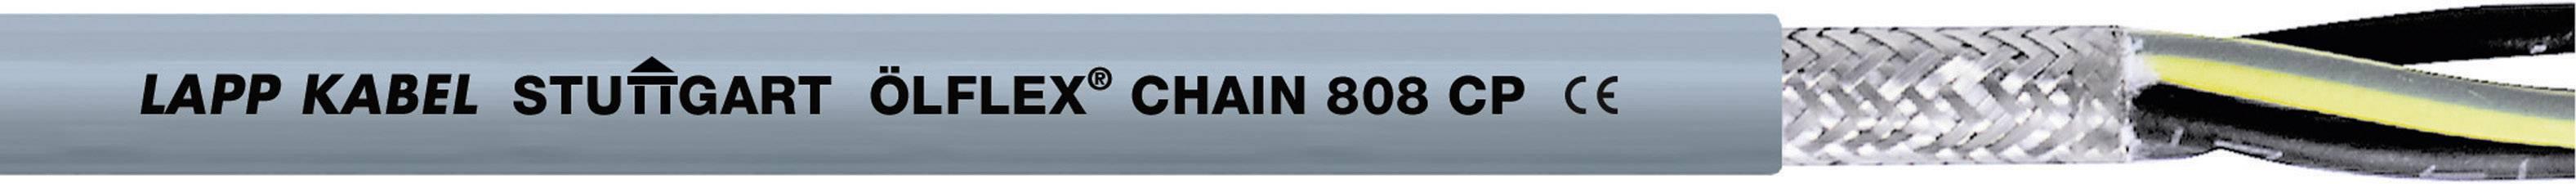 Žíla kabelu LappKabel ÖLFLEX CHAIN 808 CP 4G1,0 (1027769), 4x 1 mm², polyurethan, Ø 7,5 mm, stíněný, 50 m, šed